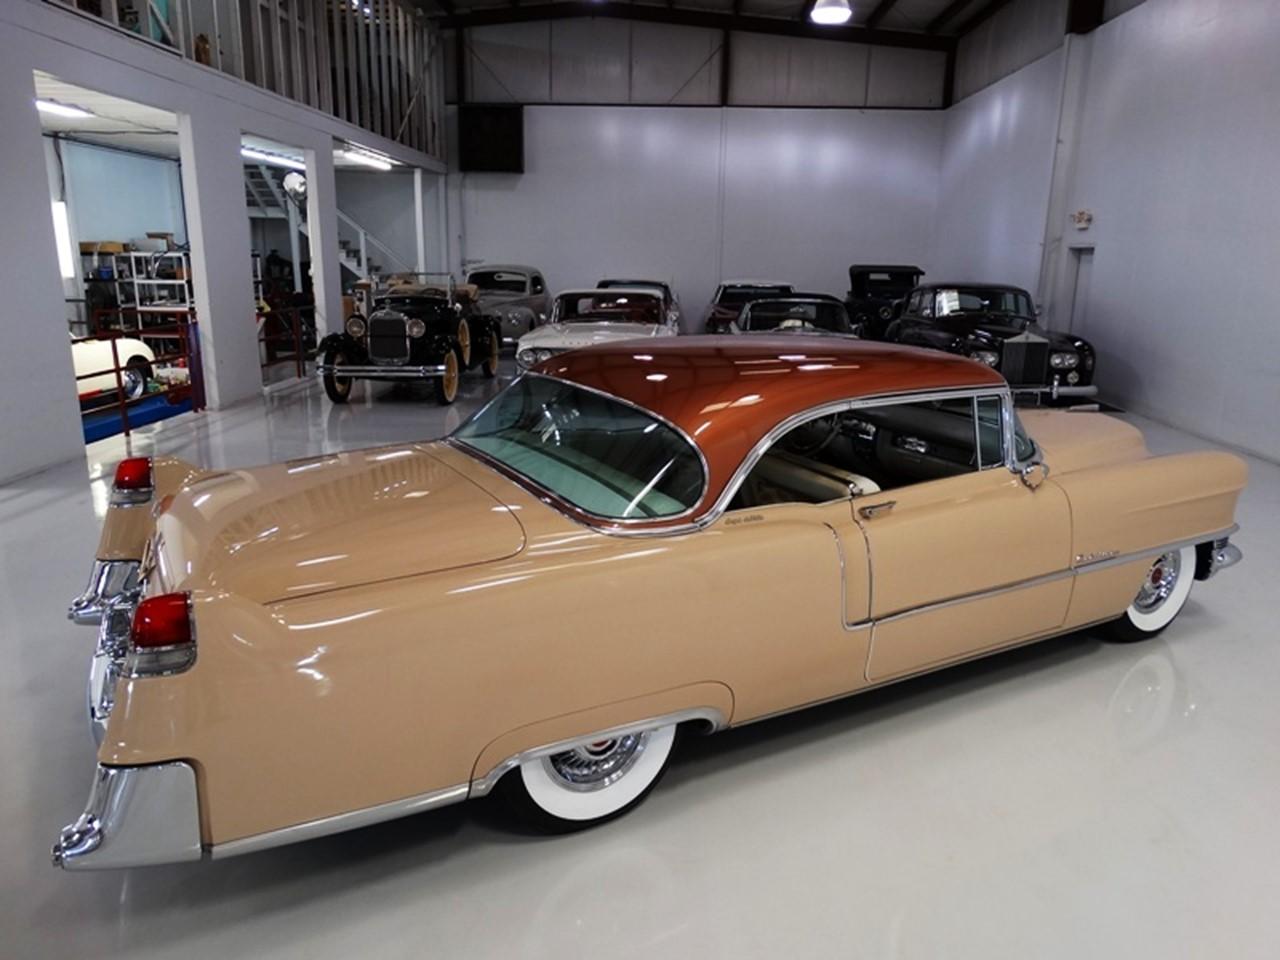 1955 Cadillac Series 62 Coupe Deville Notoriousluxury 1951 Sedan 24